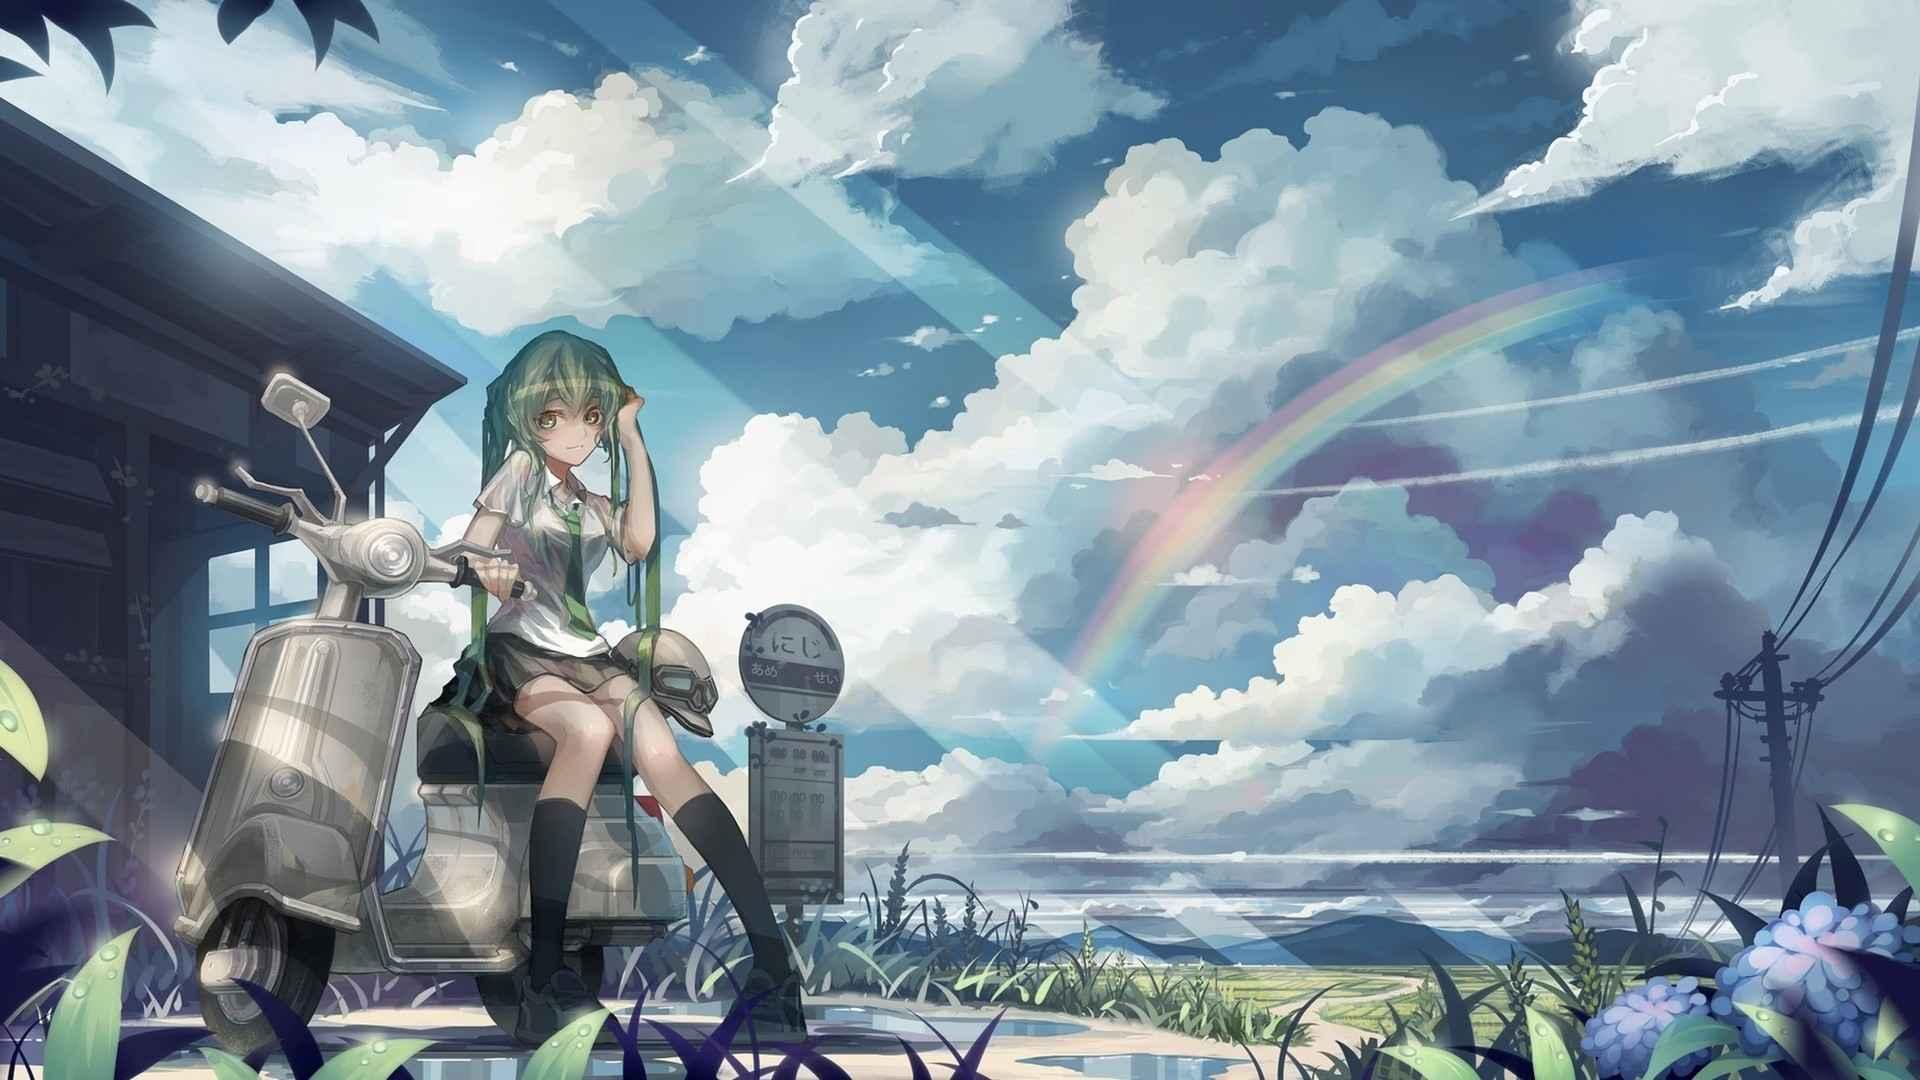 Anime wallpaper cool